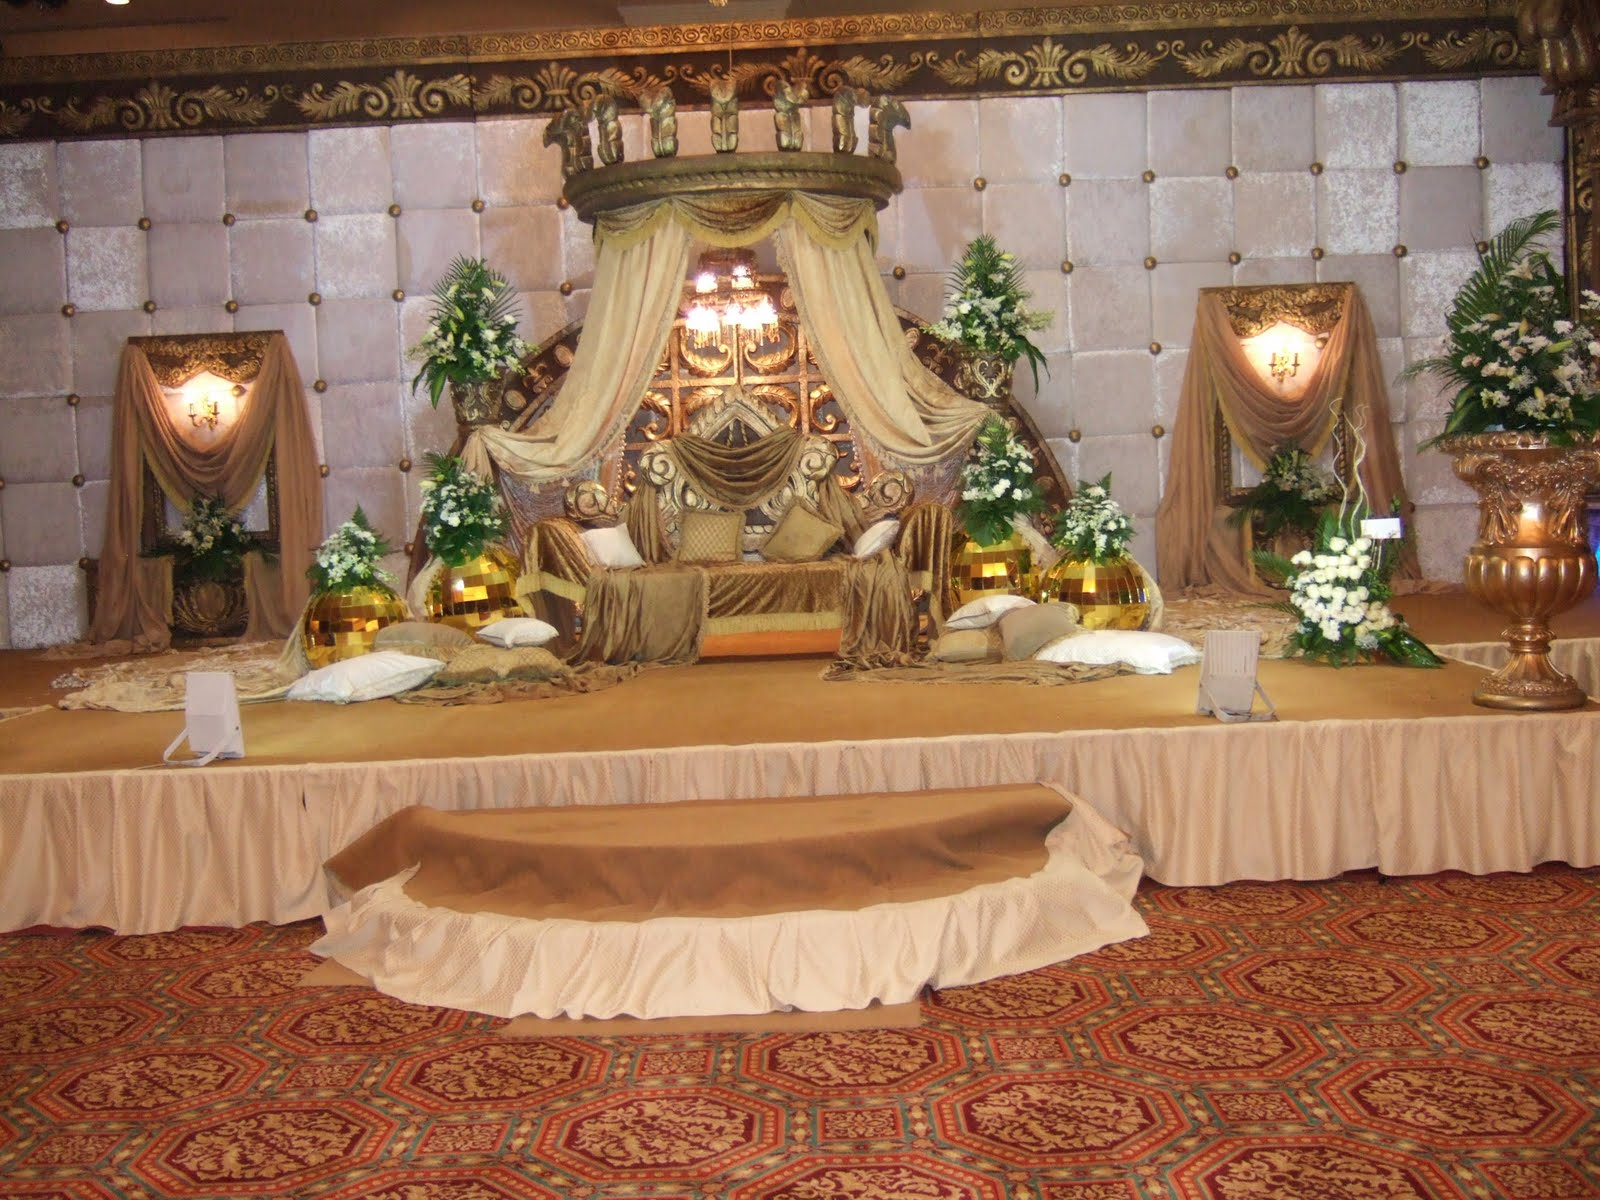 صور كوش افراح جميلة احلي كوشات اعراس (15)